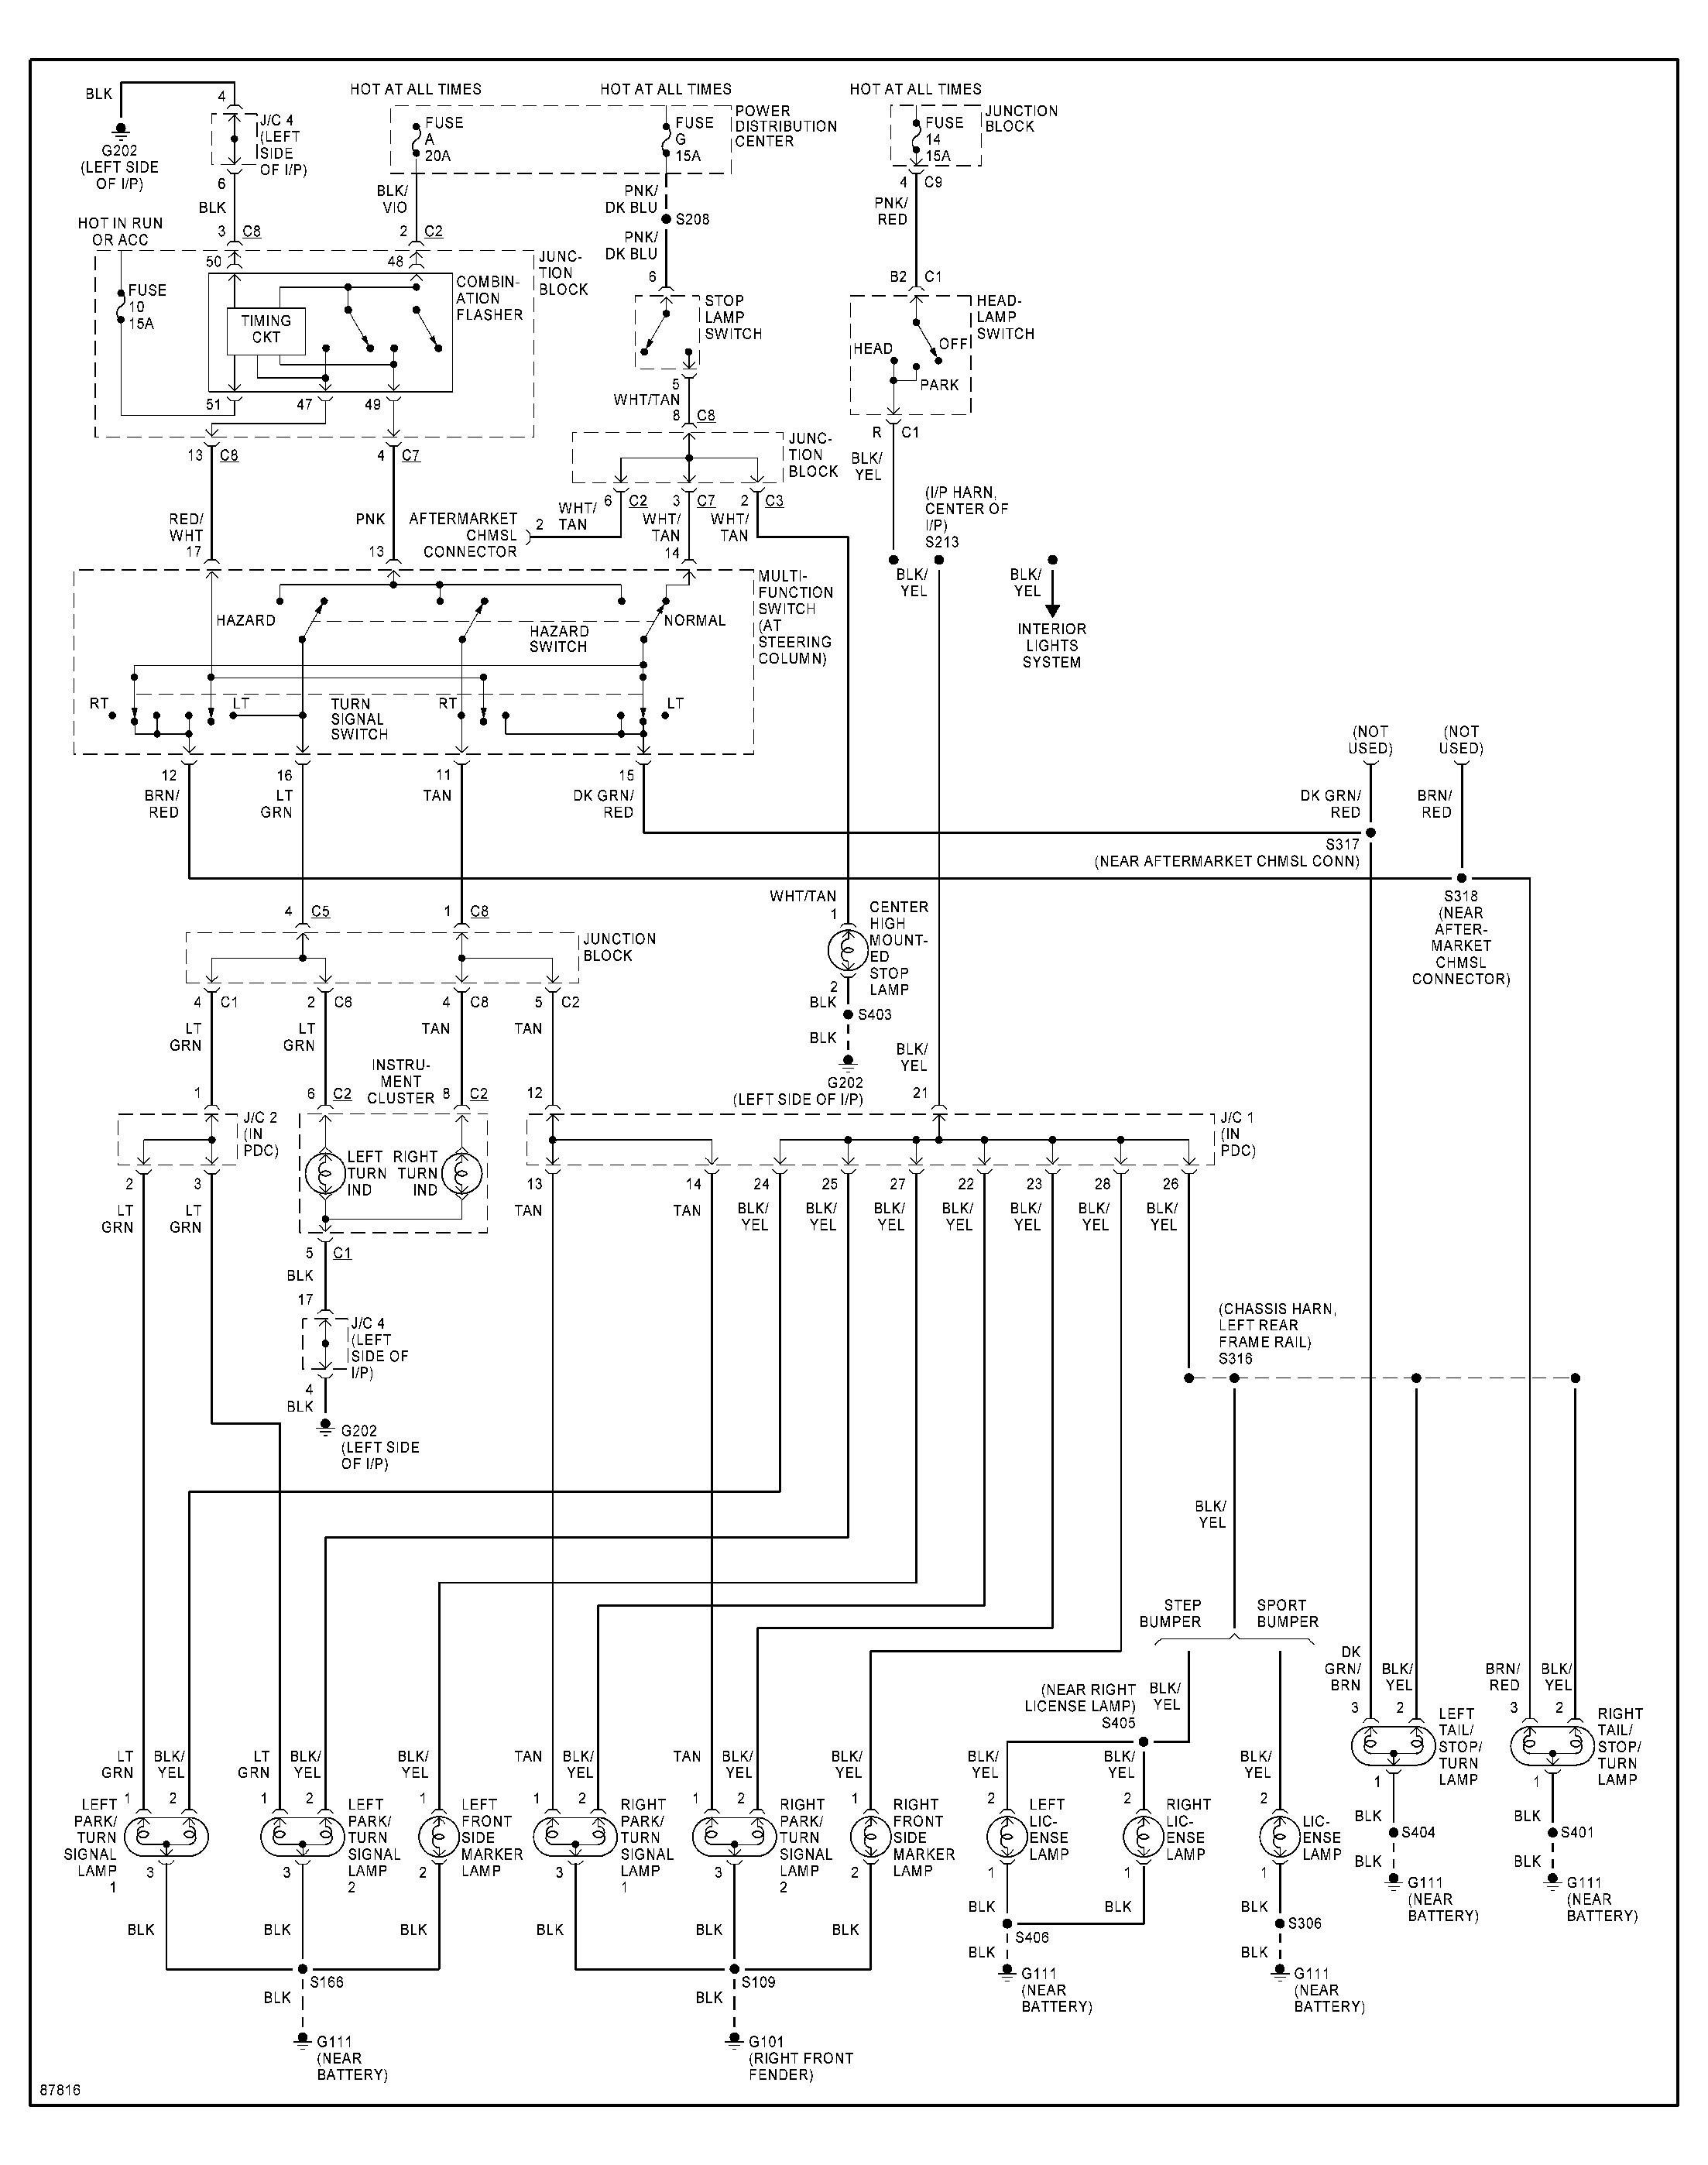 2008 Malibu Starter Circuit Schematic 2001 Sterling Wiring Diagrams 2001 ford Escape Wiring Of 2008 Malibu Starter Circuit Schematic